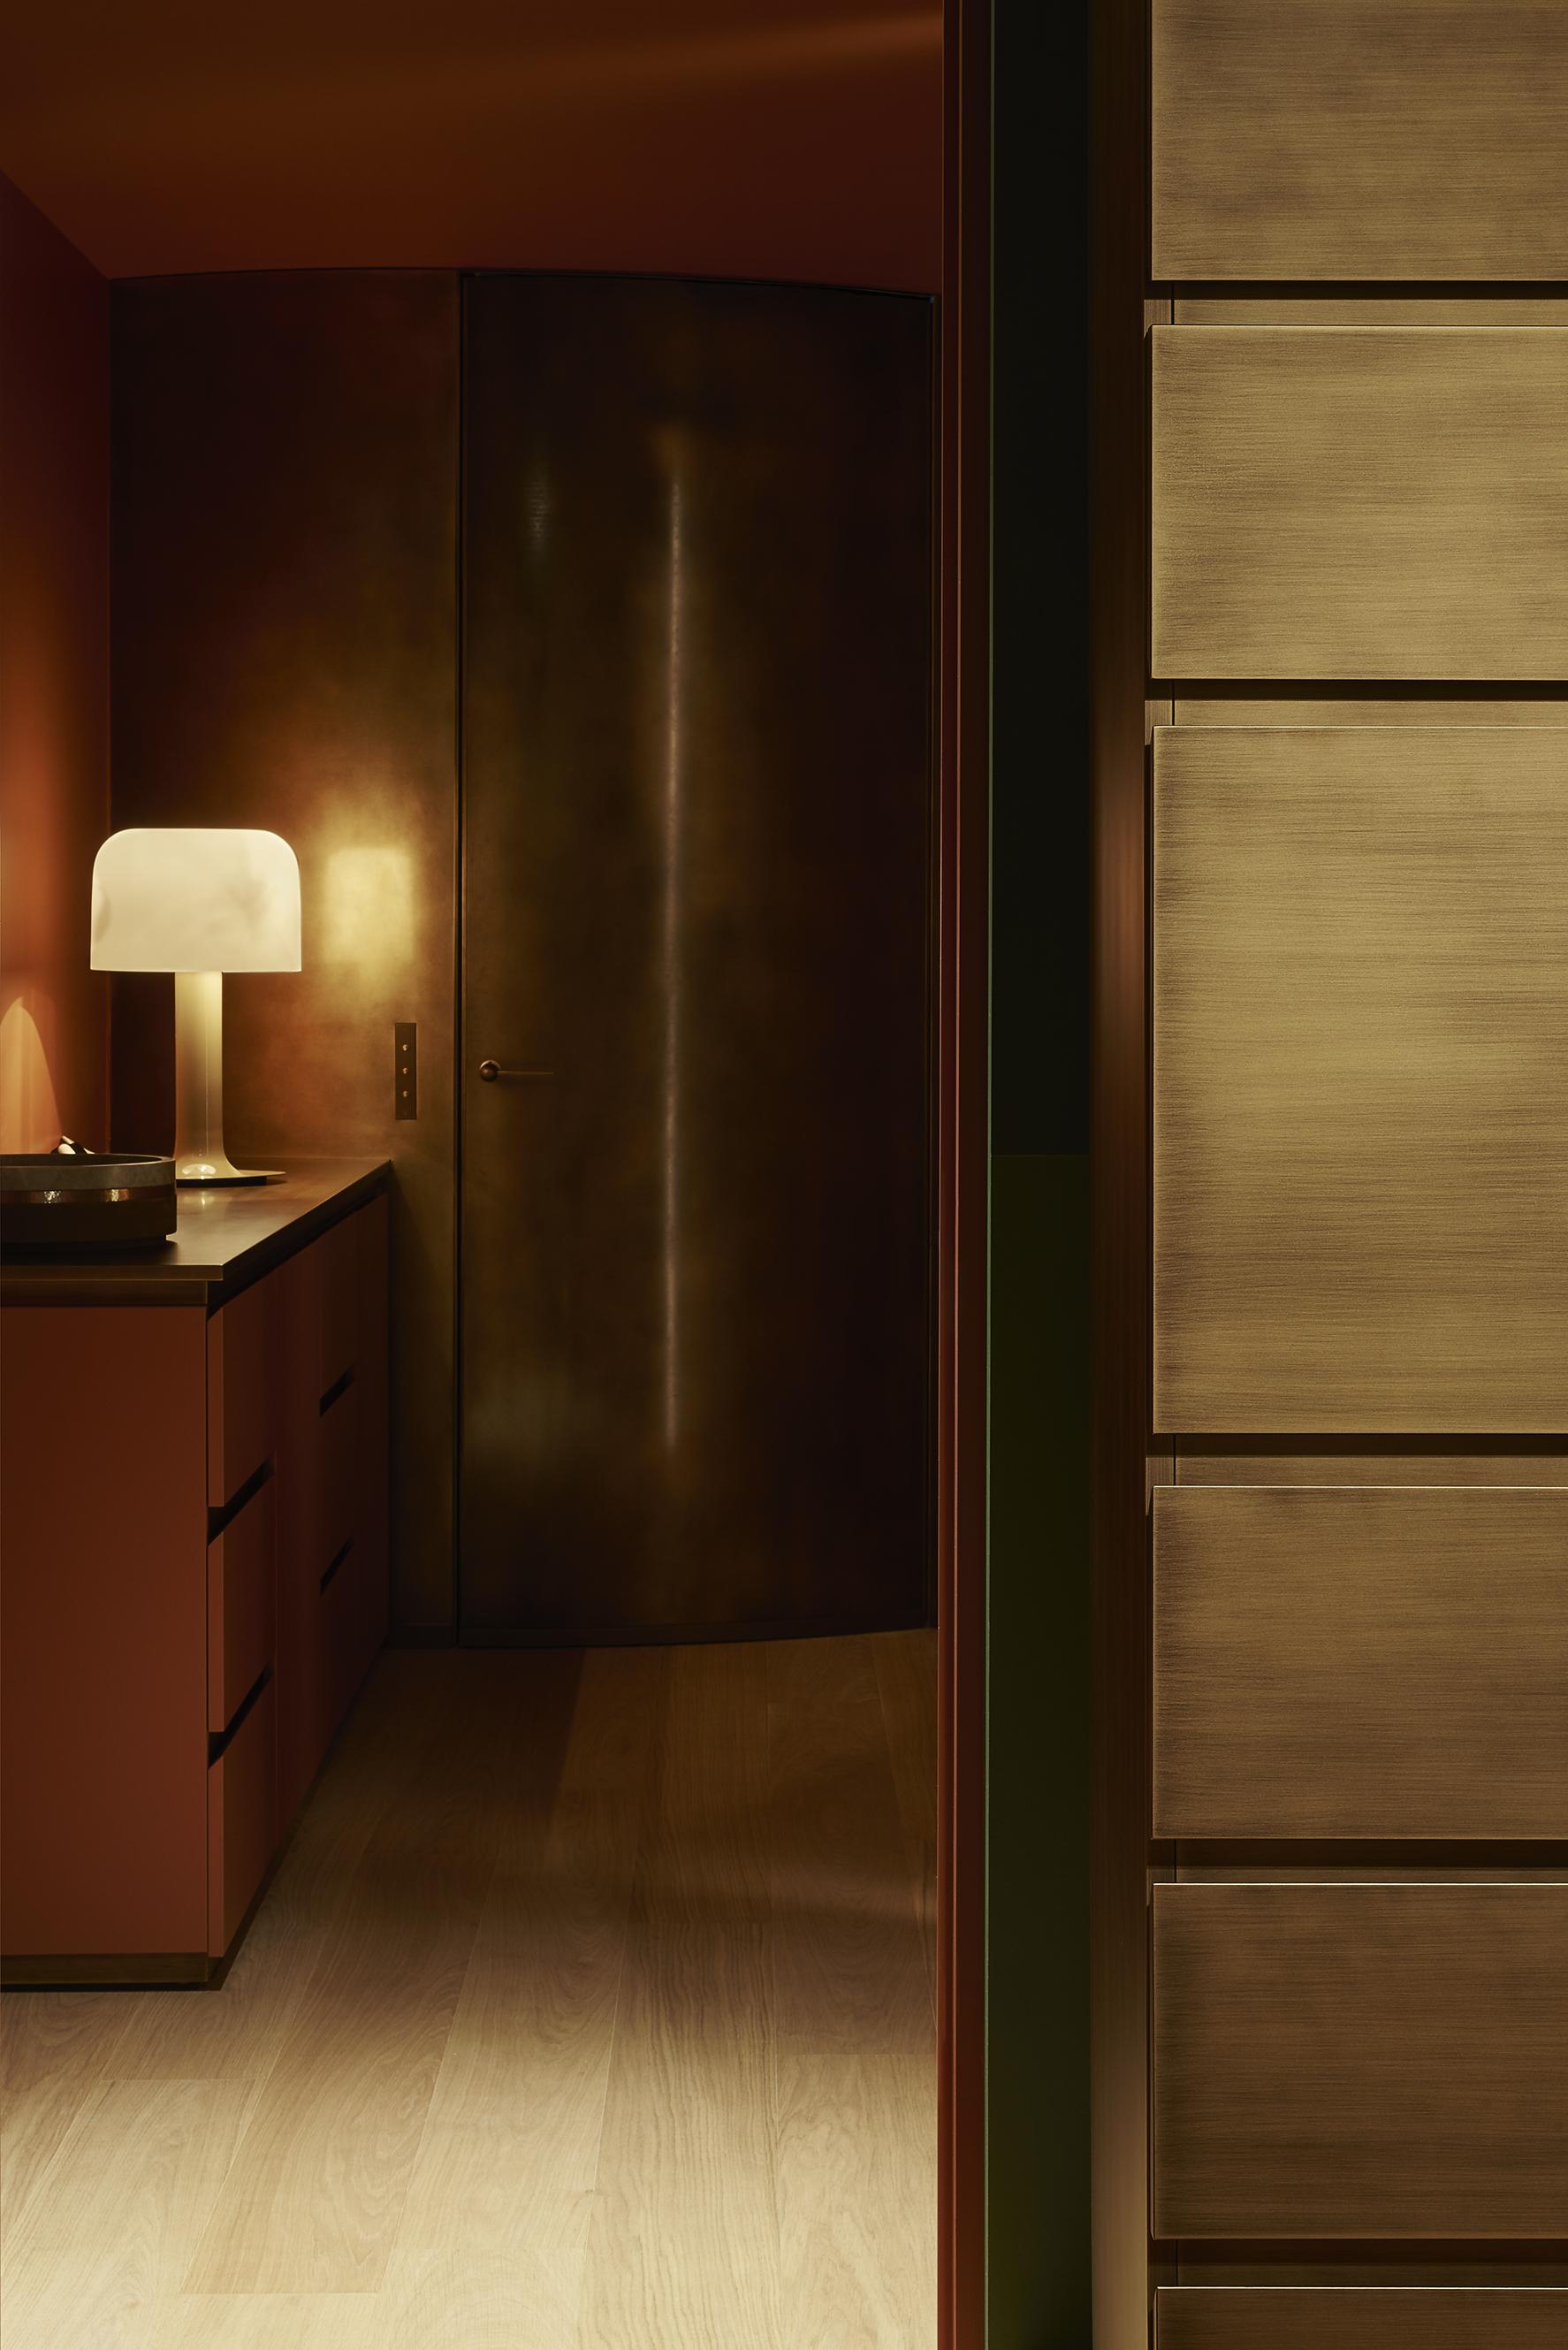 006-Rodolphe_Parente_Appartement_Sud